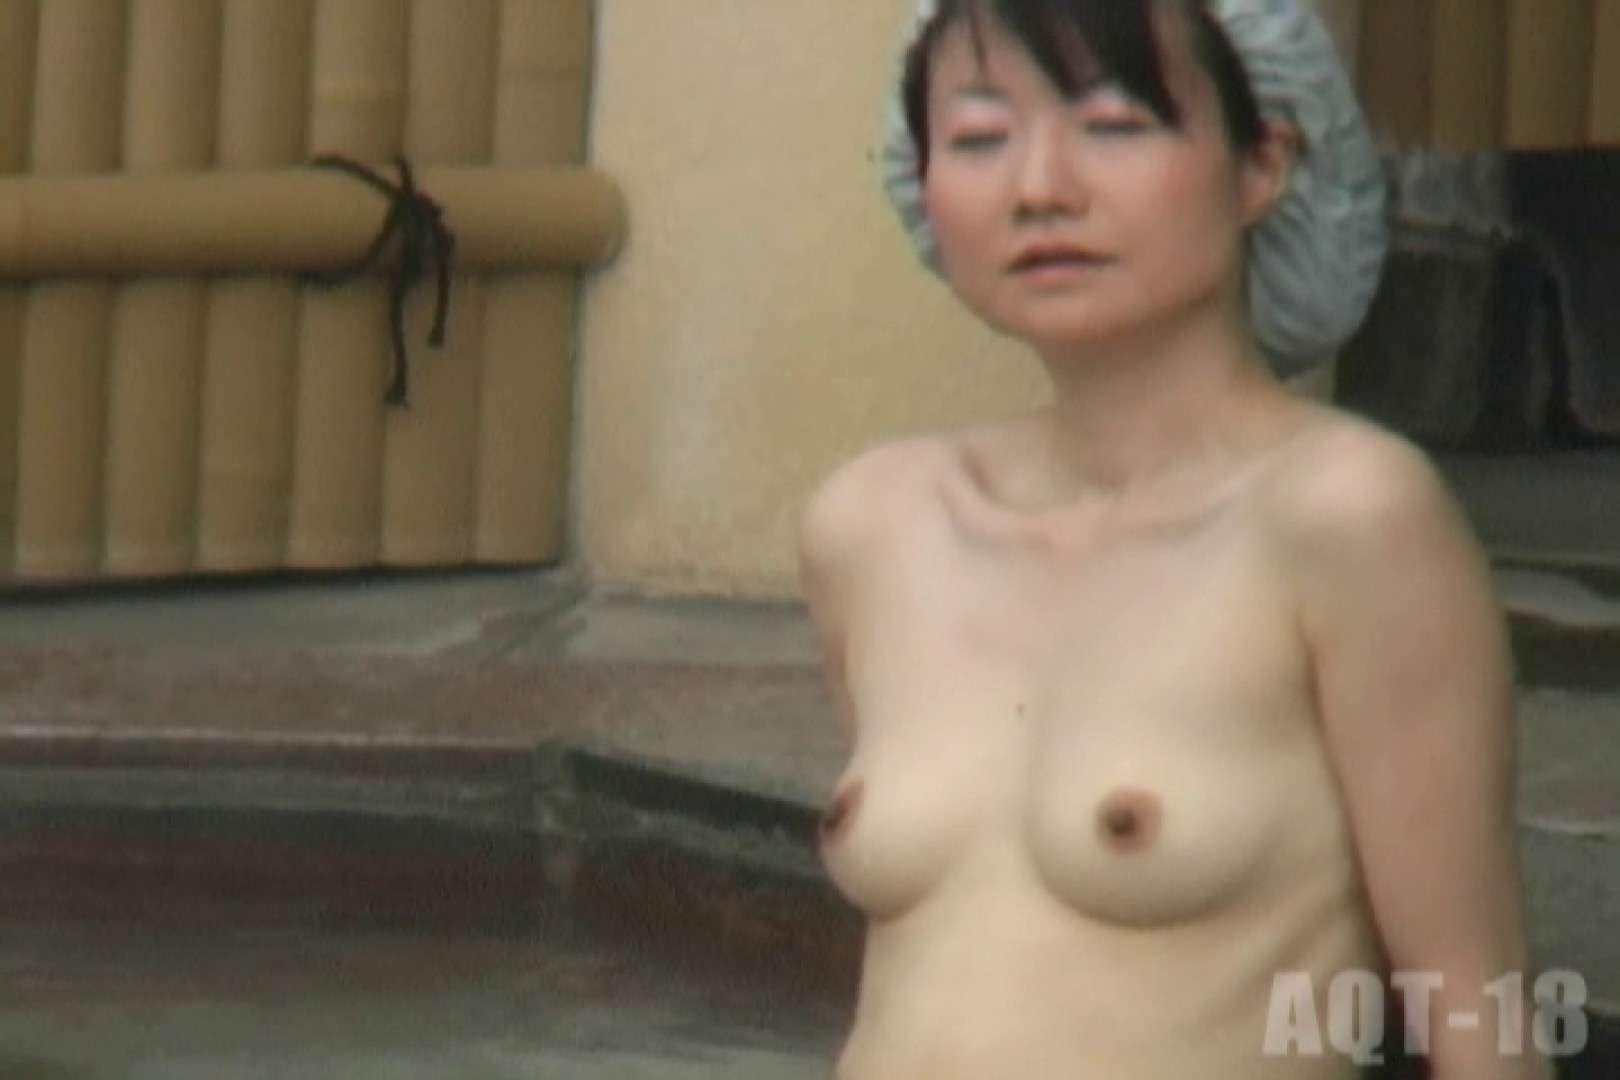 Aquaな露天風呂Vol.864 OLセックス | 露天  68画像 10